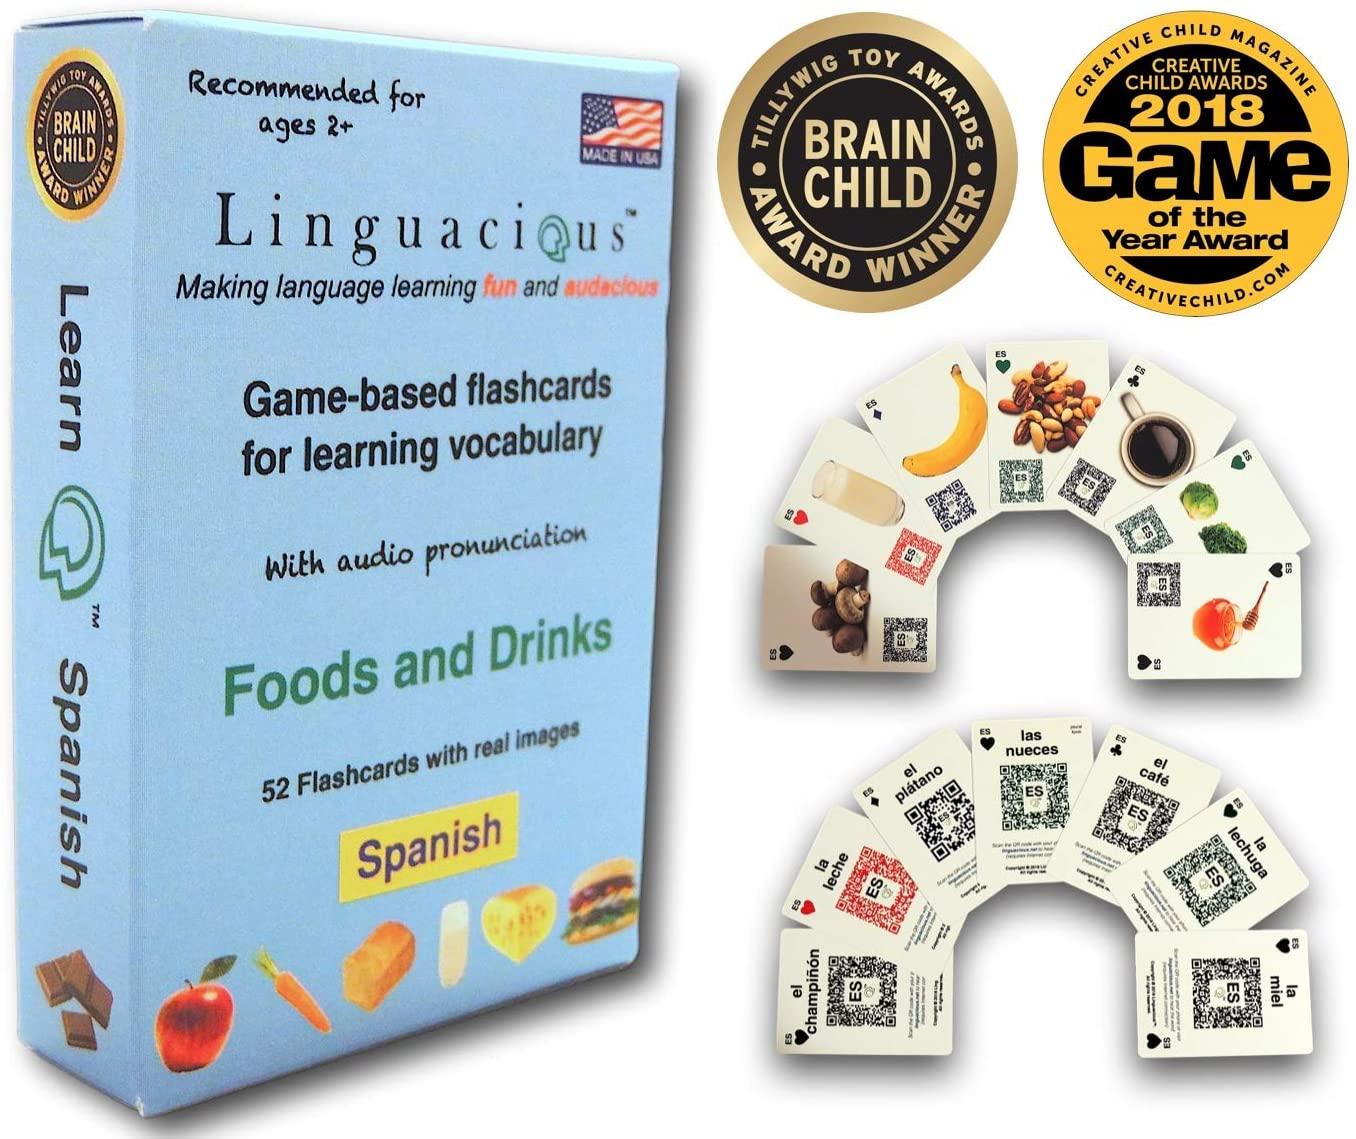 Linguacious Award-Winning Spanish Foods and Drinks Flashcard Game - with Audio!